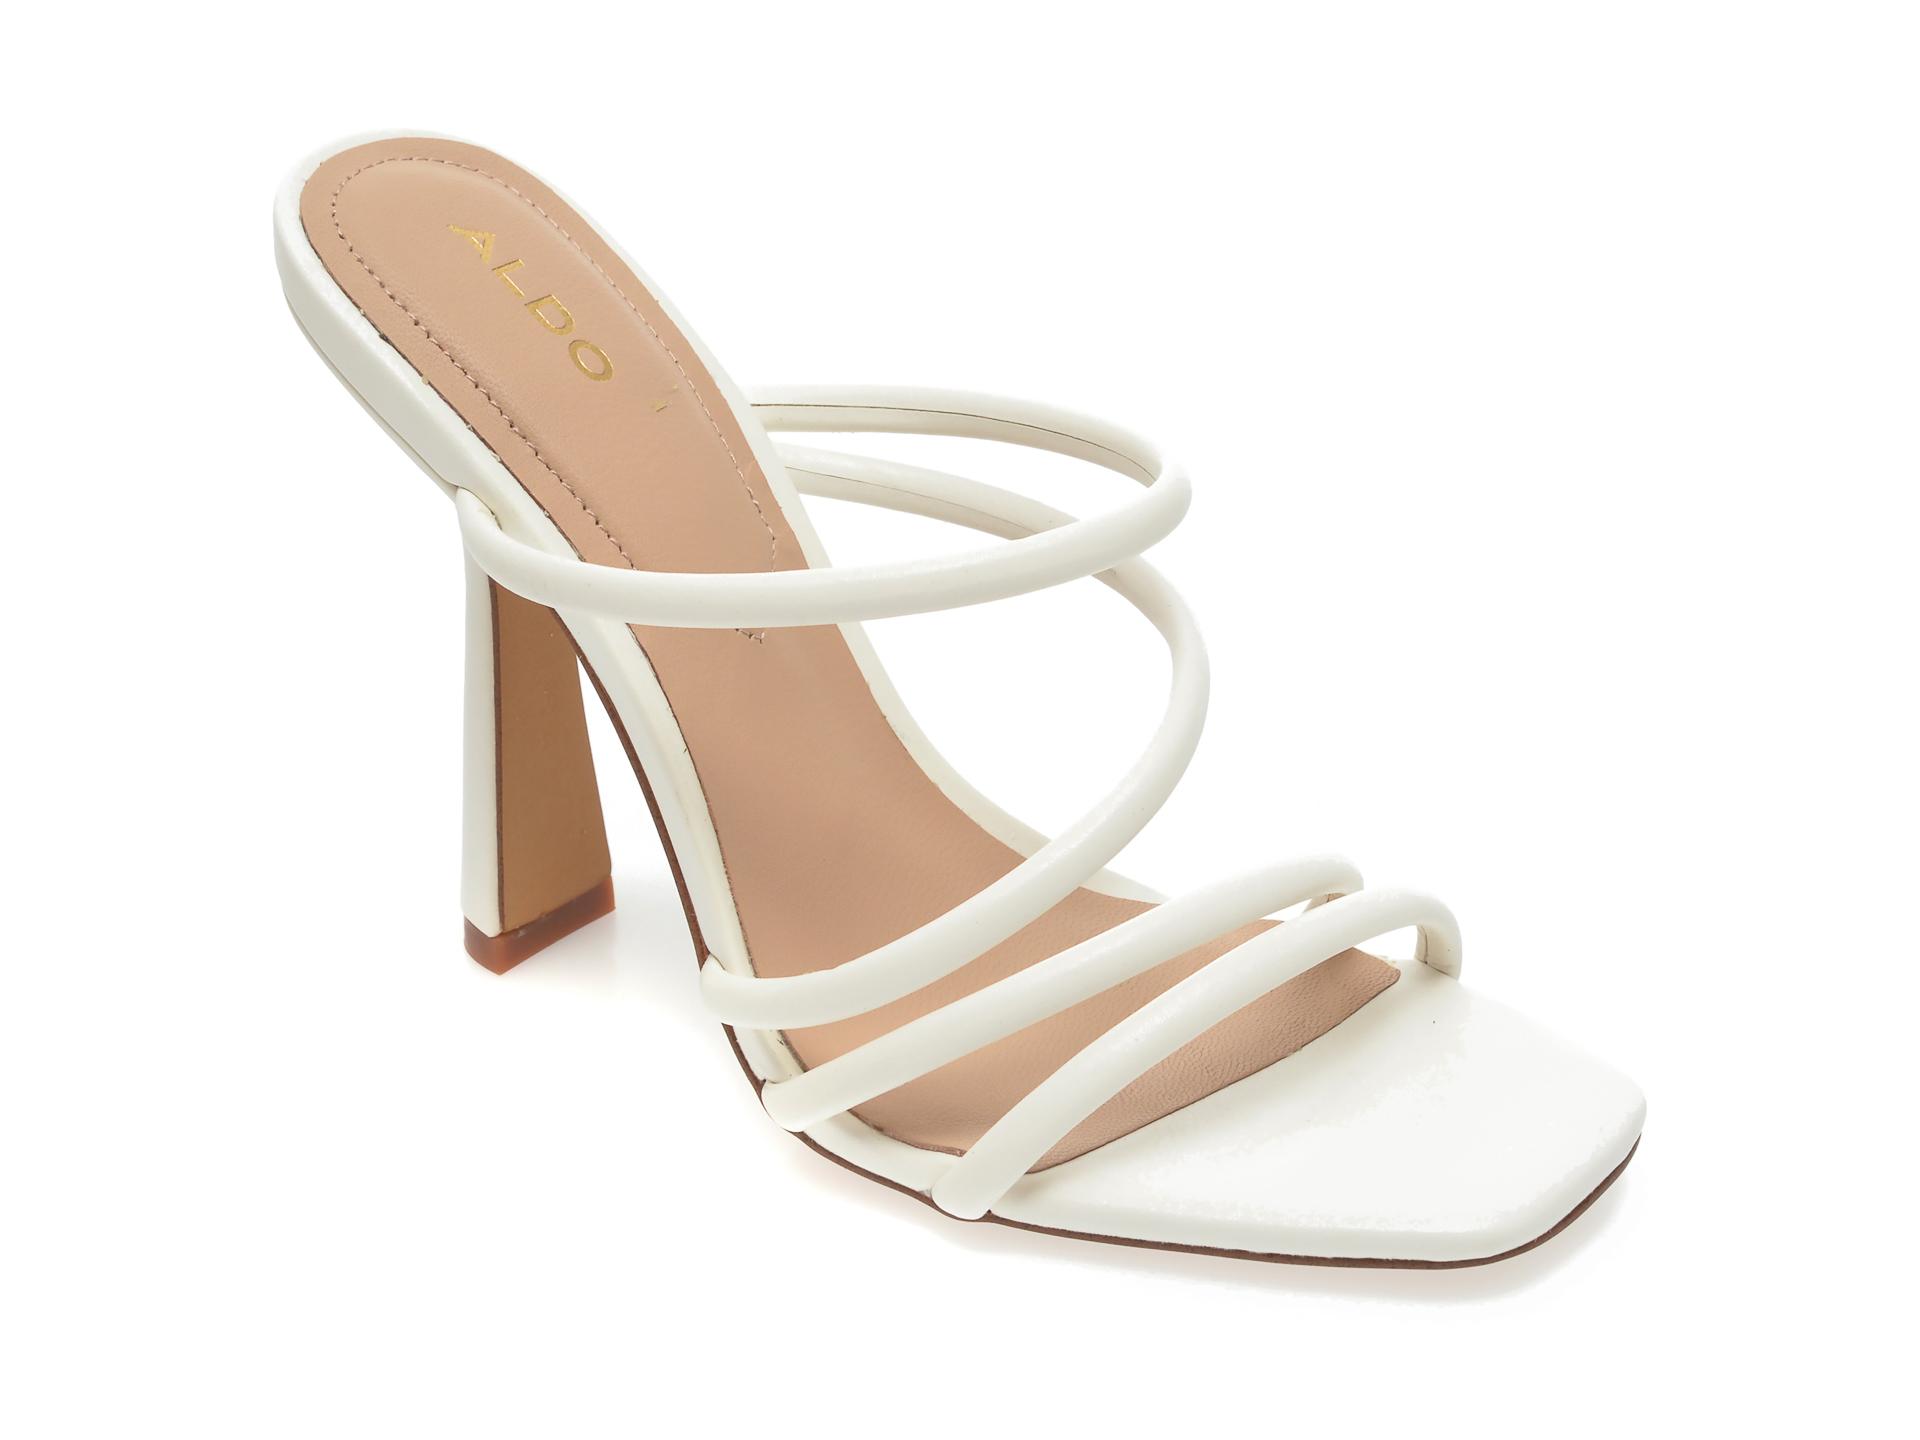 Papuci ALDO albi, Arianna100, din piele ecologica imagine otter.ro